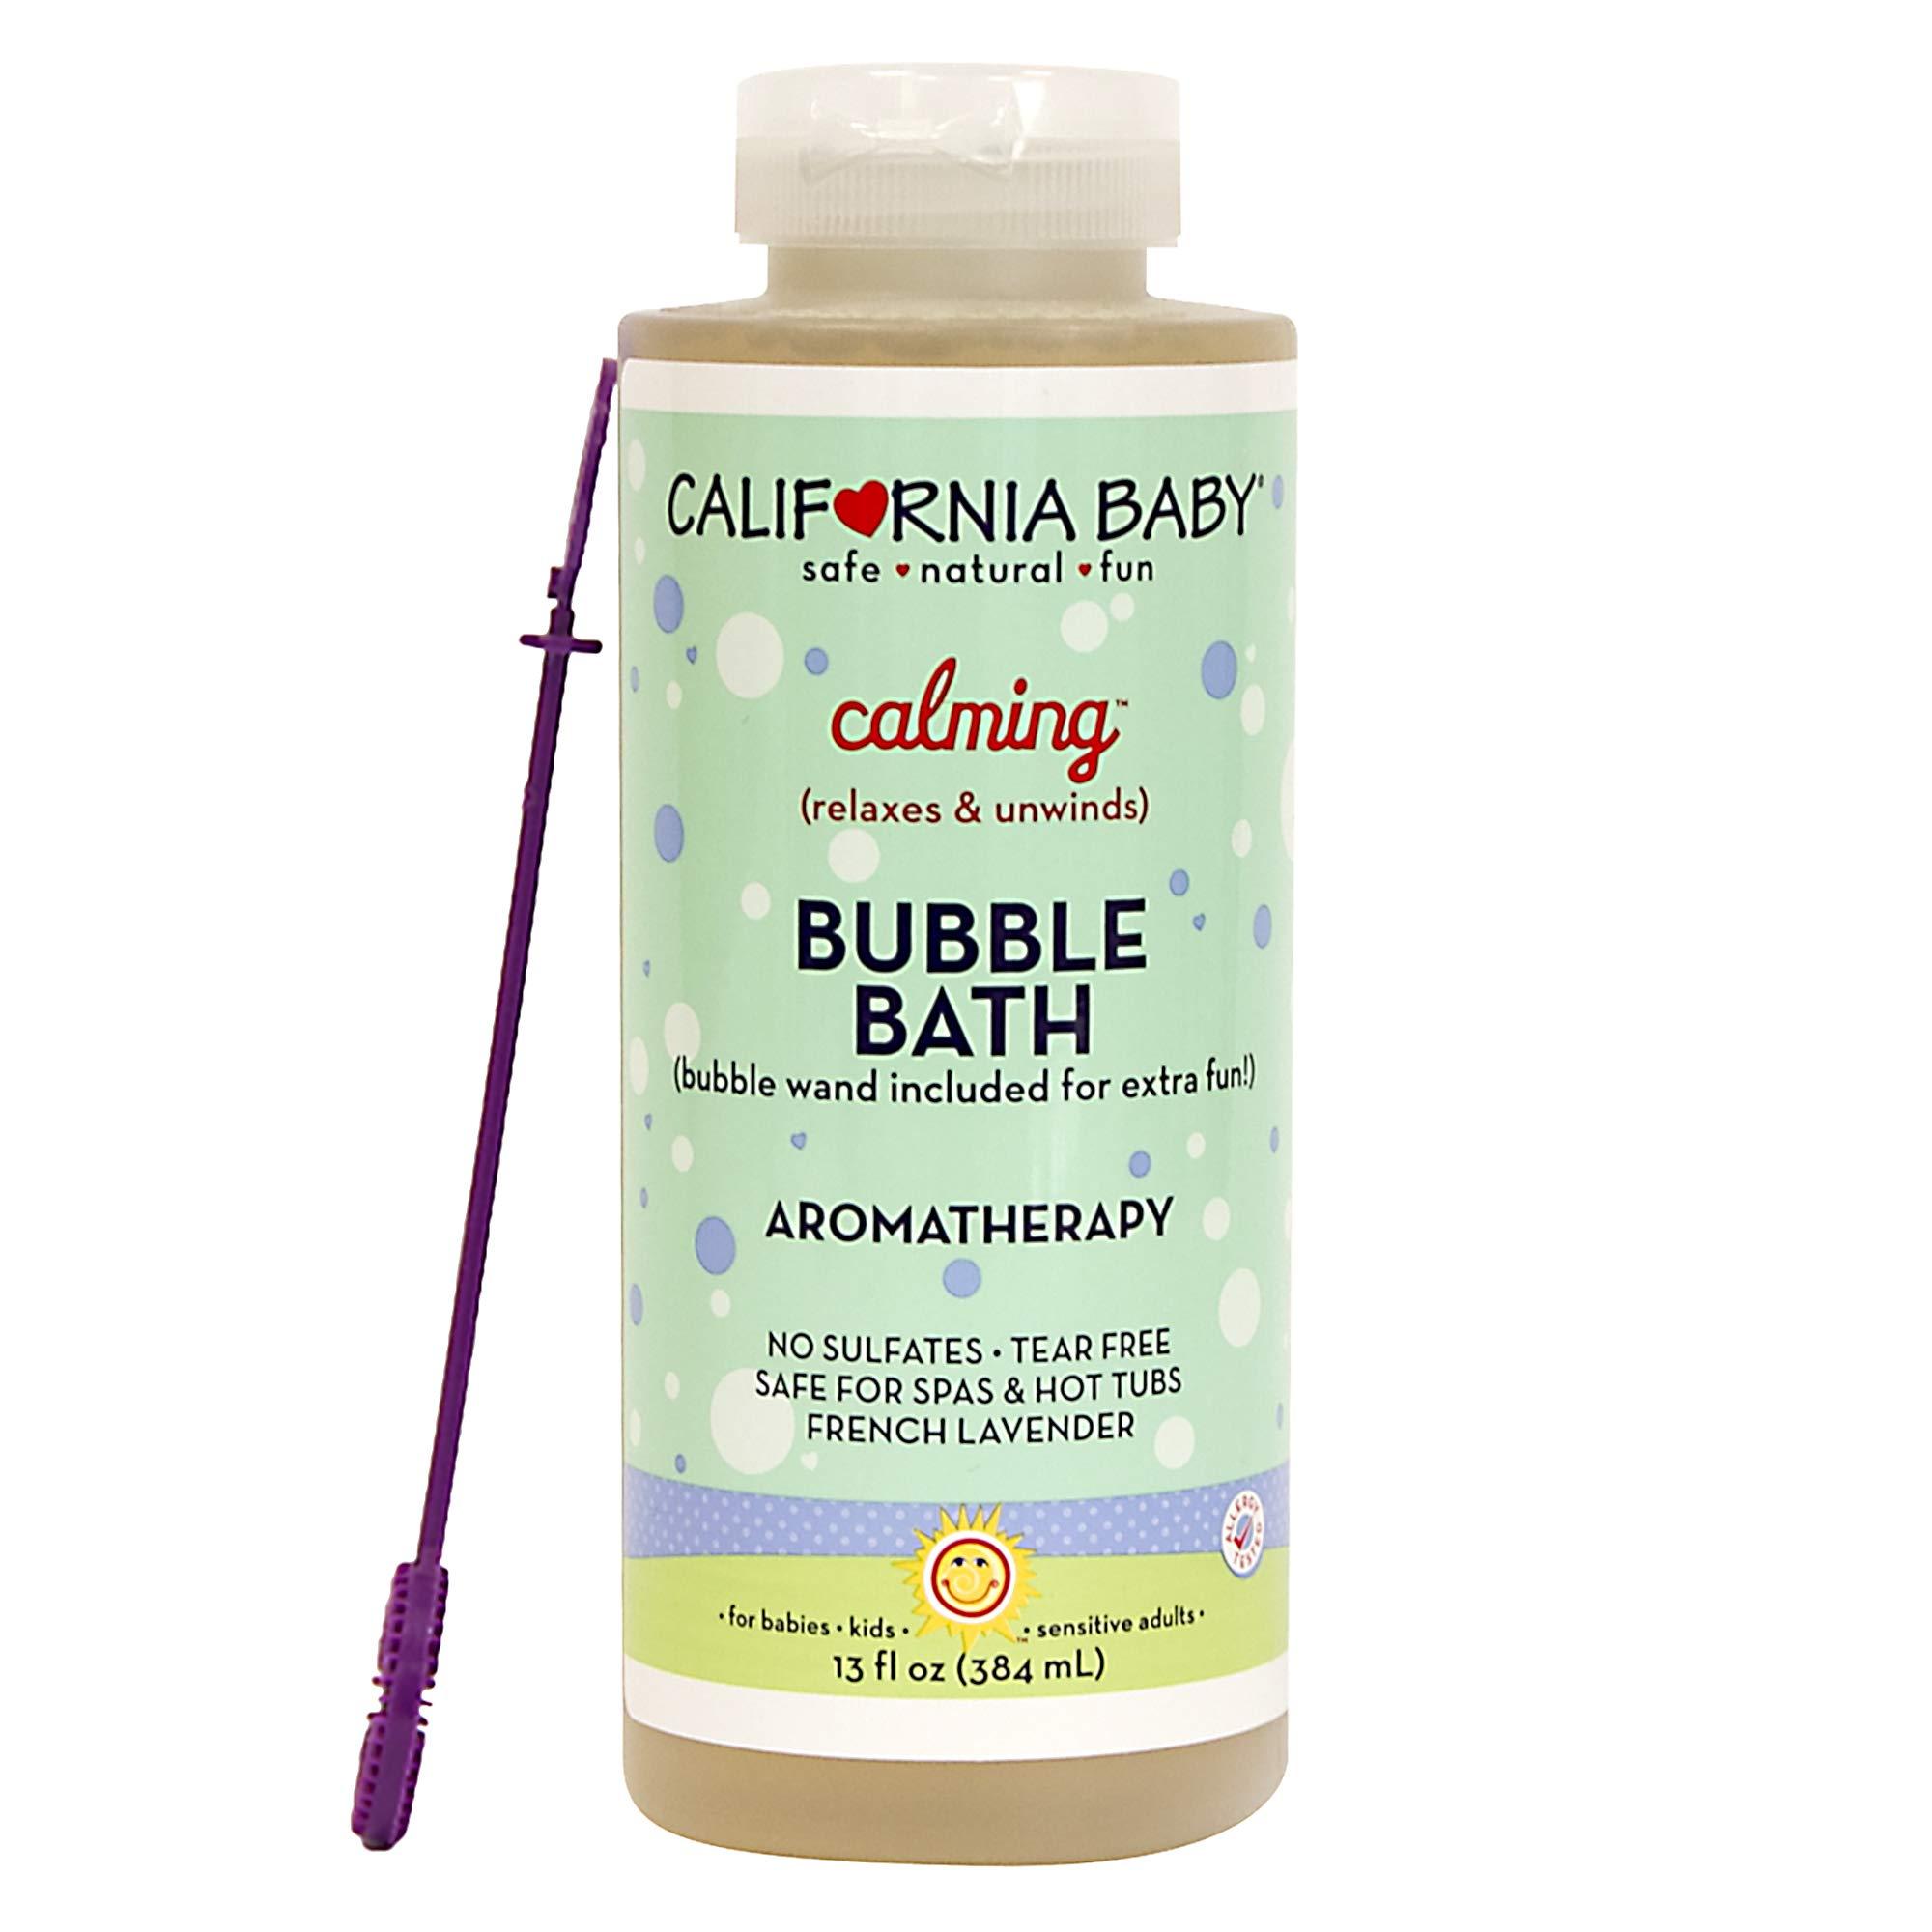 California Baby Calming Bubble Bath, No Tear, Pure Essential Oils for Bathing, Hot Tubs, or Spa Use, Moisturizing Organic Aloe Vera and Calendula Extract (13 fl. ounces) by California Baby